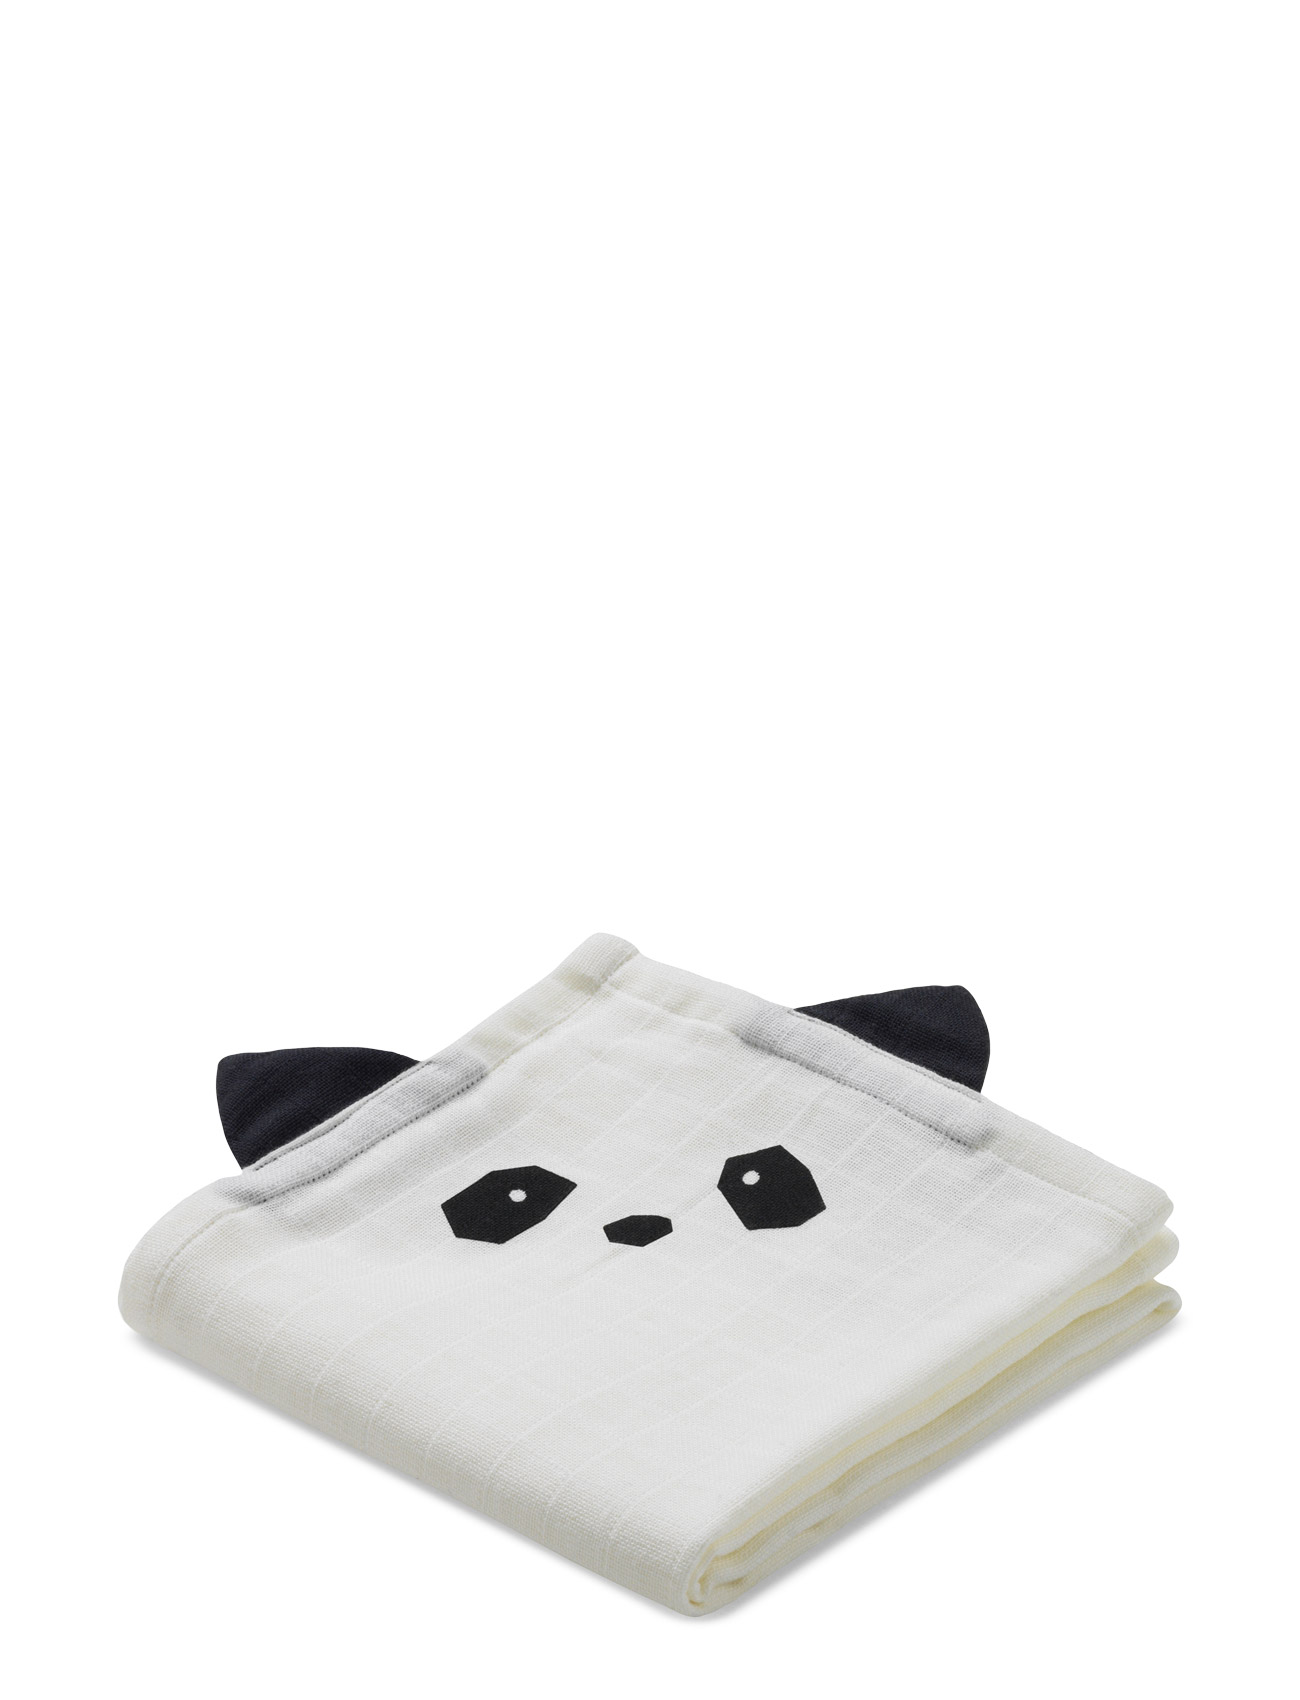 Hannah Muslin Cloth - 2 Pack Liewood Baby accessories til Børn i